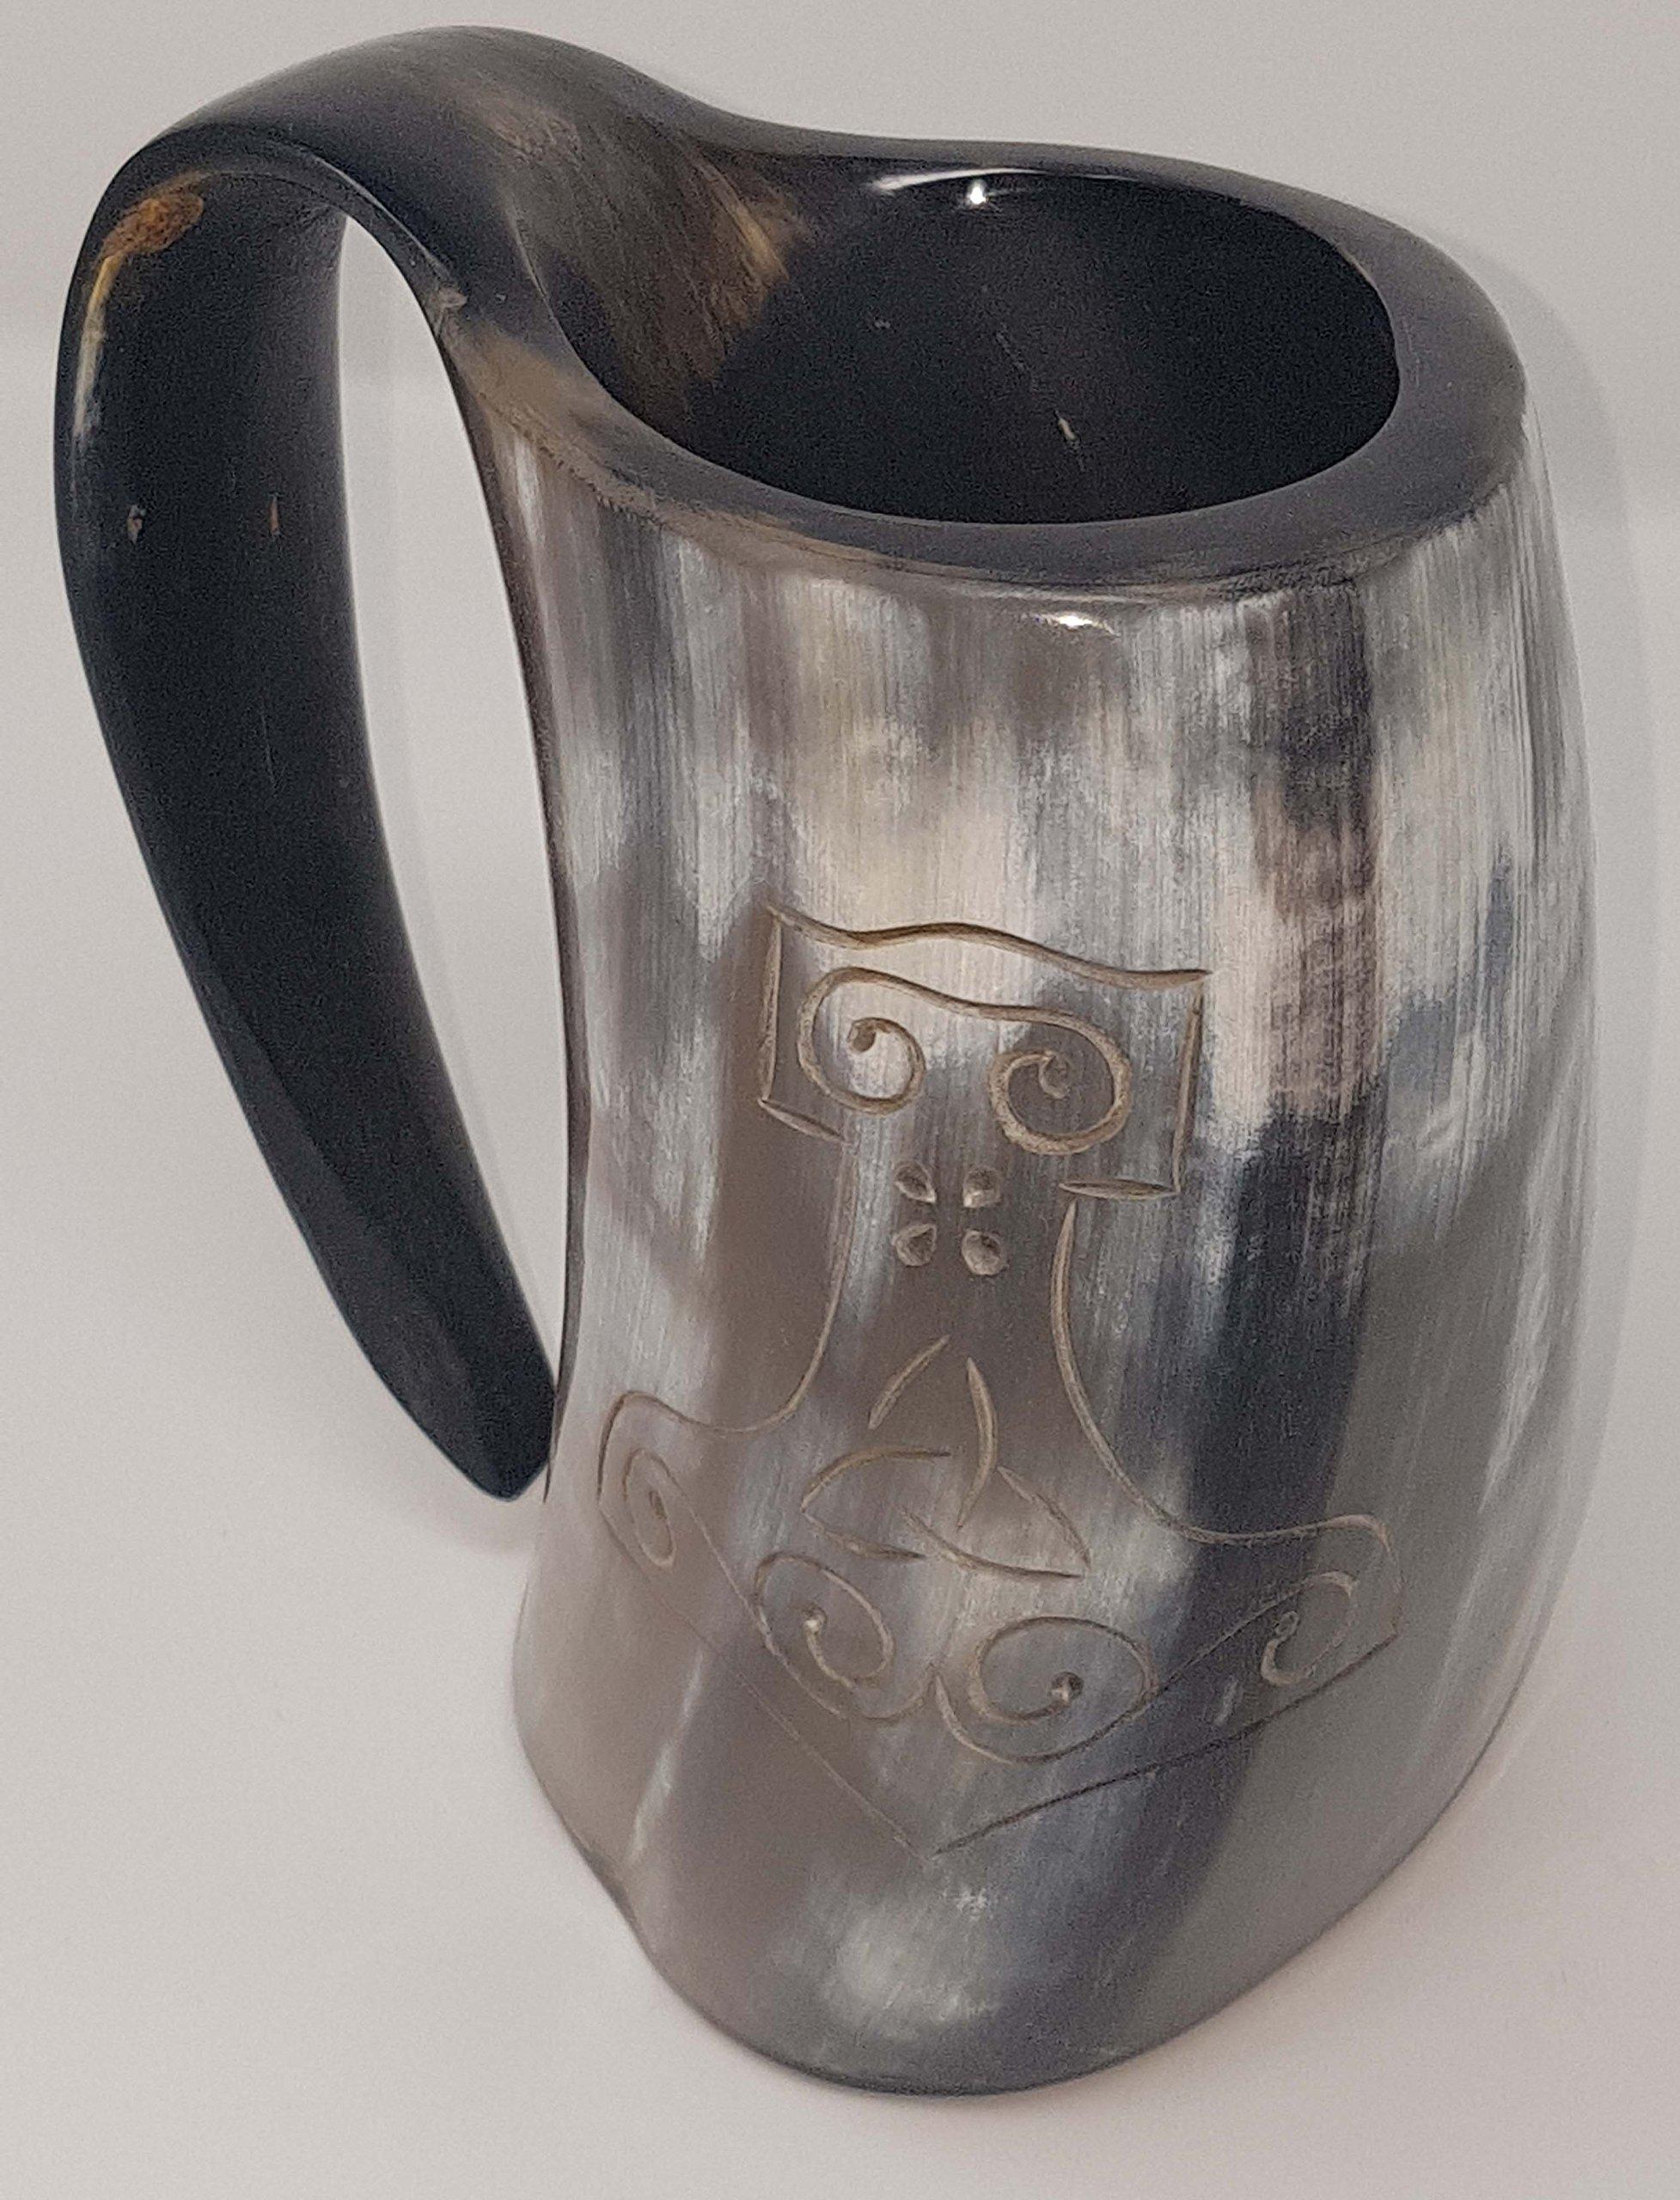 BRANDED Polished Thor's Hand Engraved Handcrafted XL Handmade 6 Inch Game of Thrones style Drinking Mug Viking Beer Tankard/Wine Mug 28 Oz